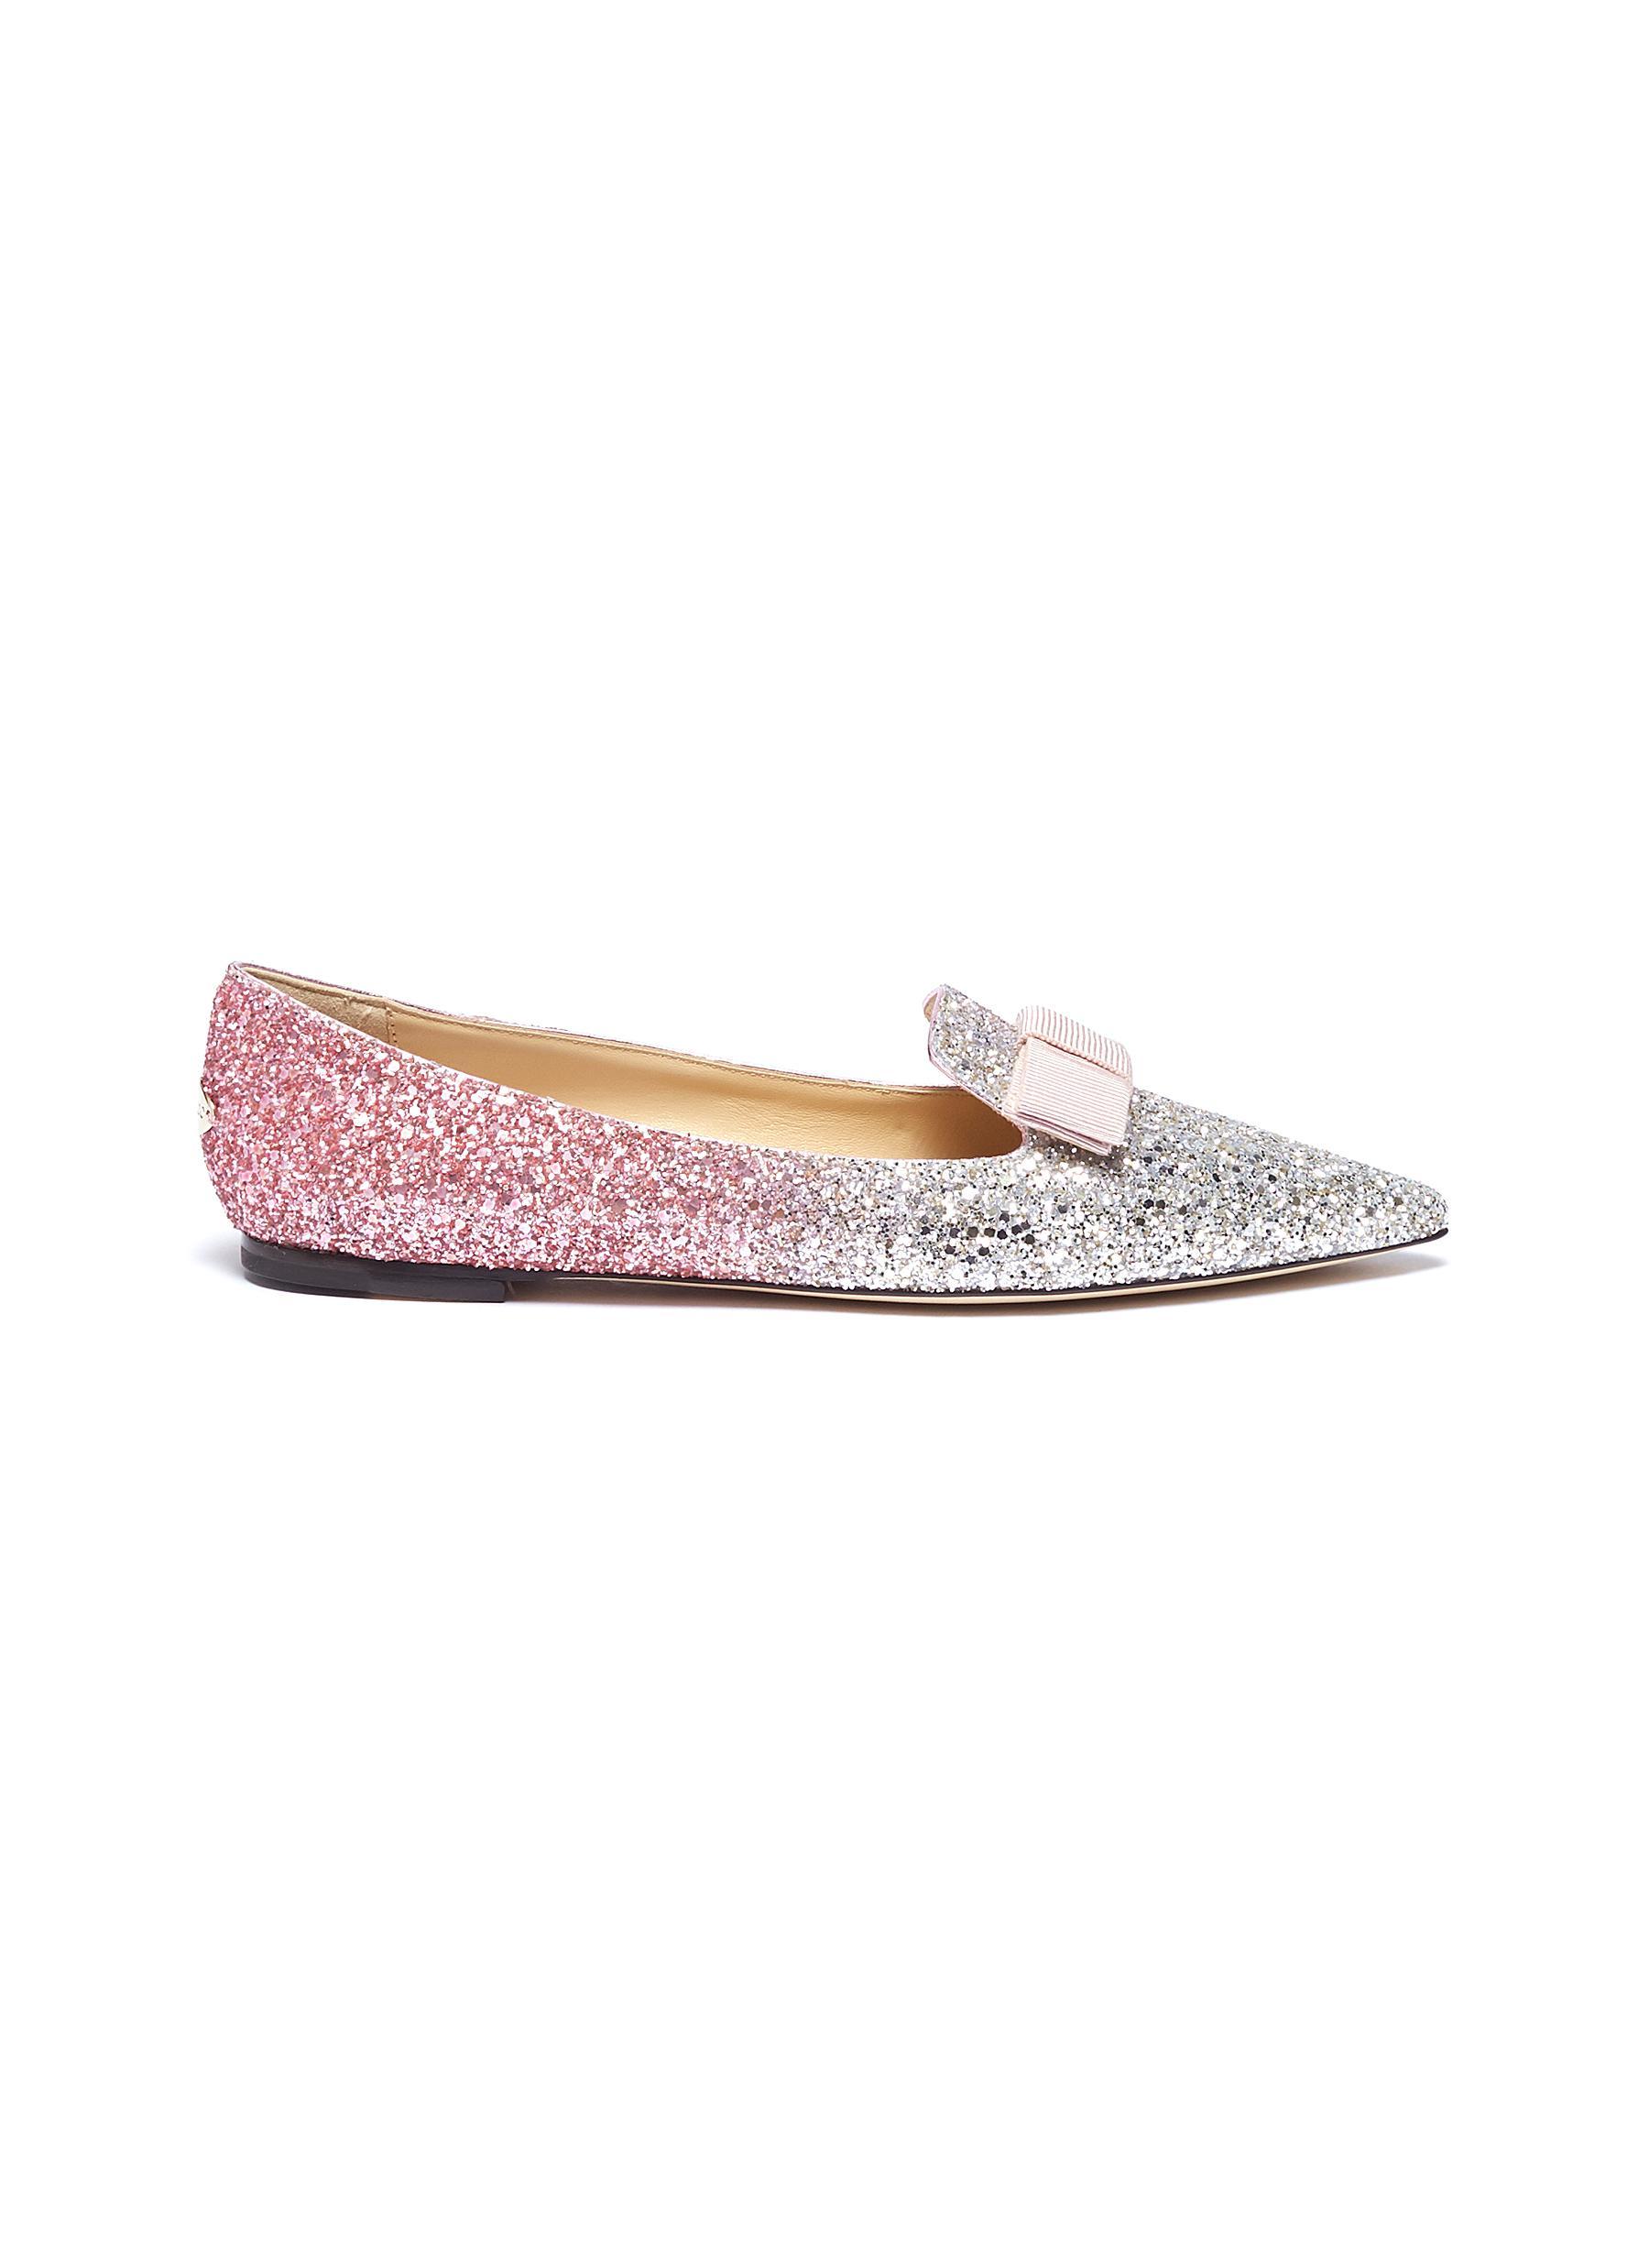 Gala bow dégradé coarse glitter loafers by Jimmy Choo